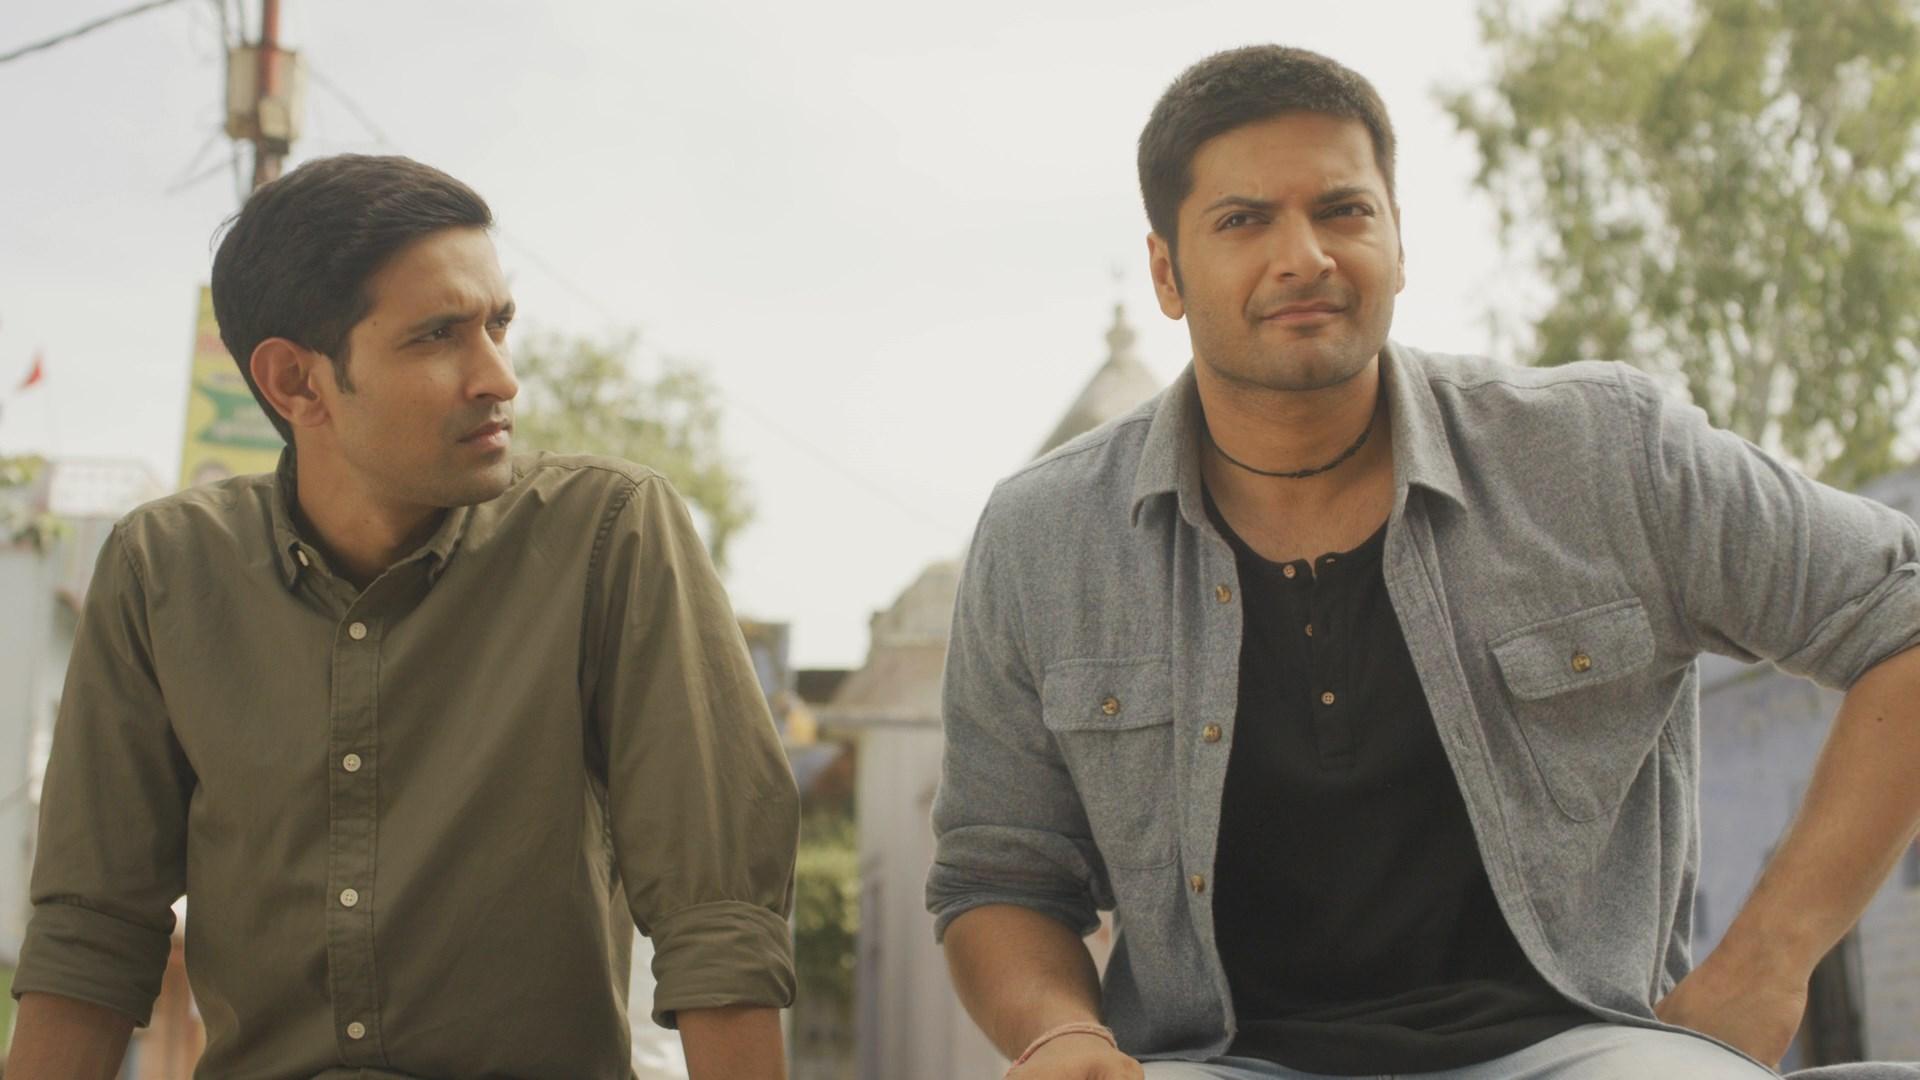 Mirzapur (Season 1) Hindi Complete WEB-DL 480p 720p 1080p ESubs | AMZN Series | Download | Watch Online